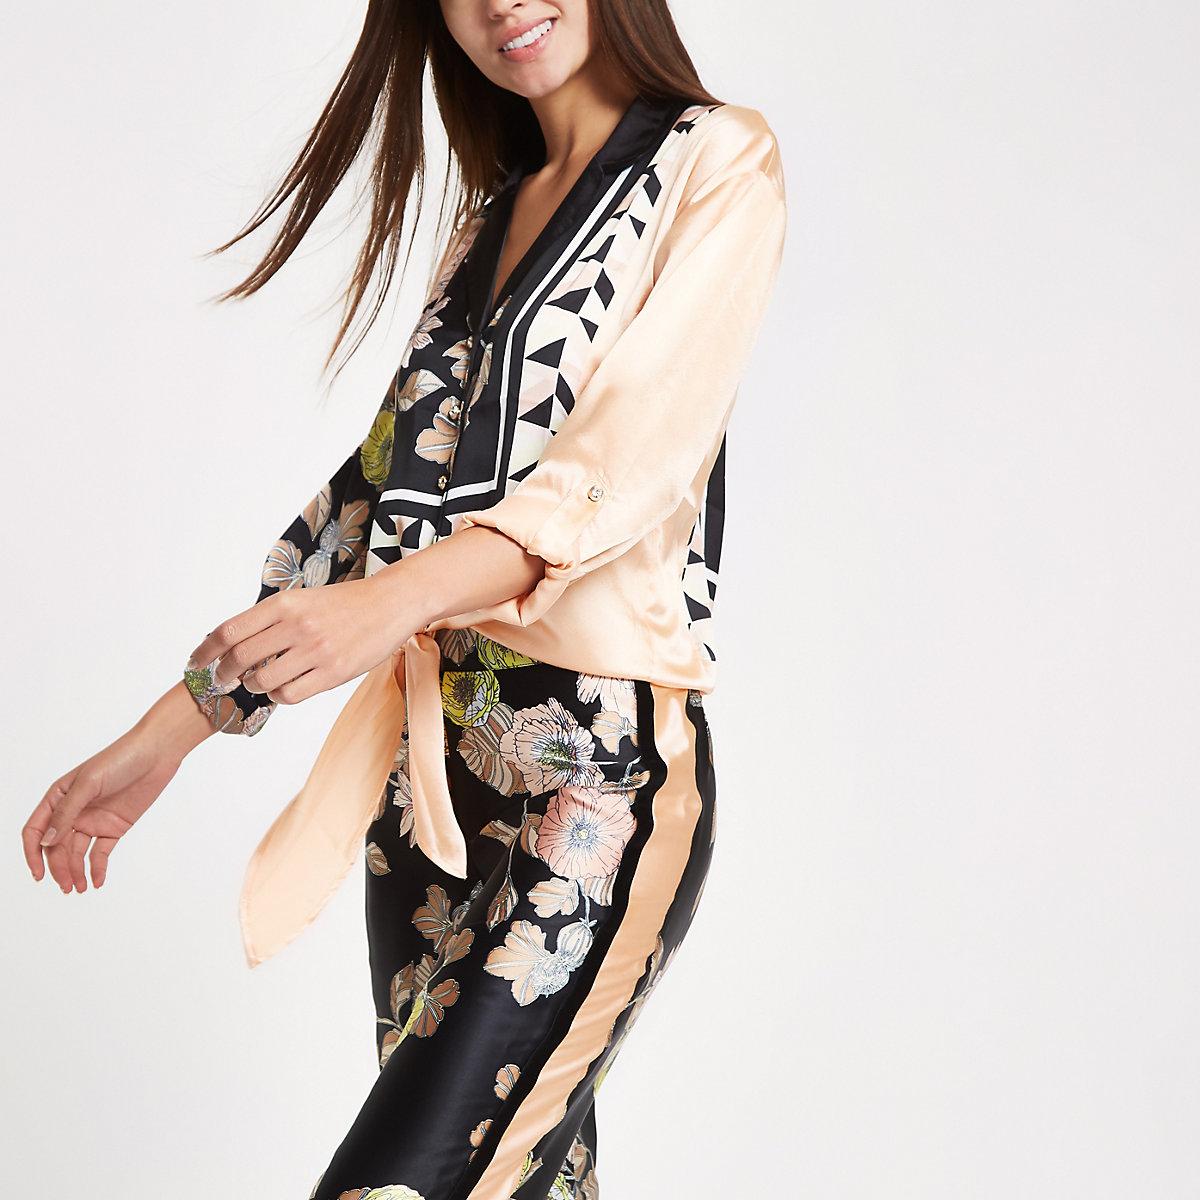 Black satin floral tie front pajama shirt